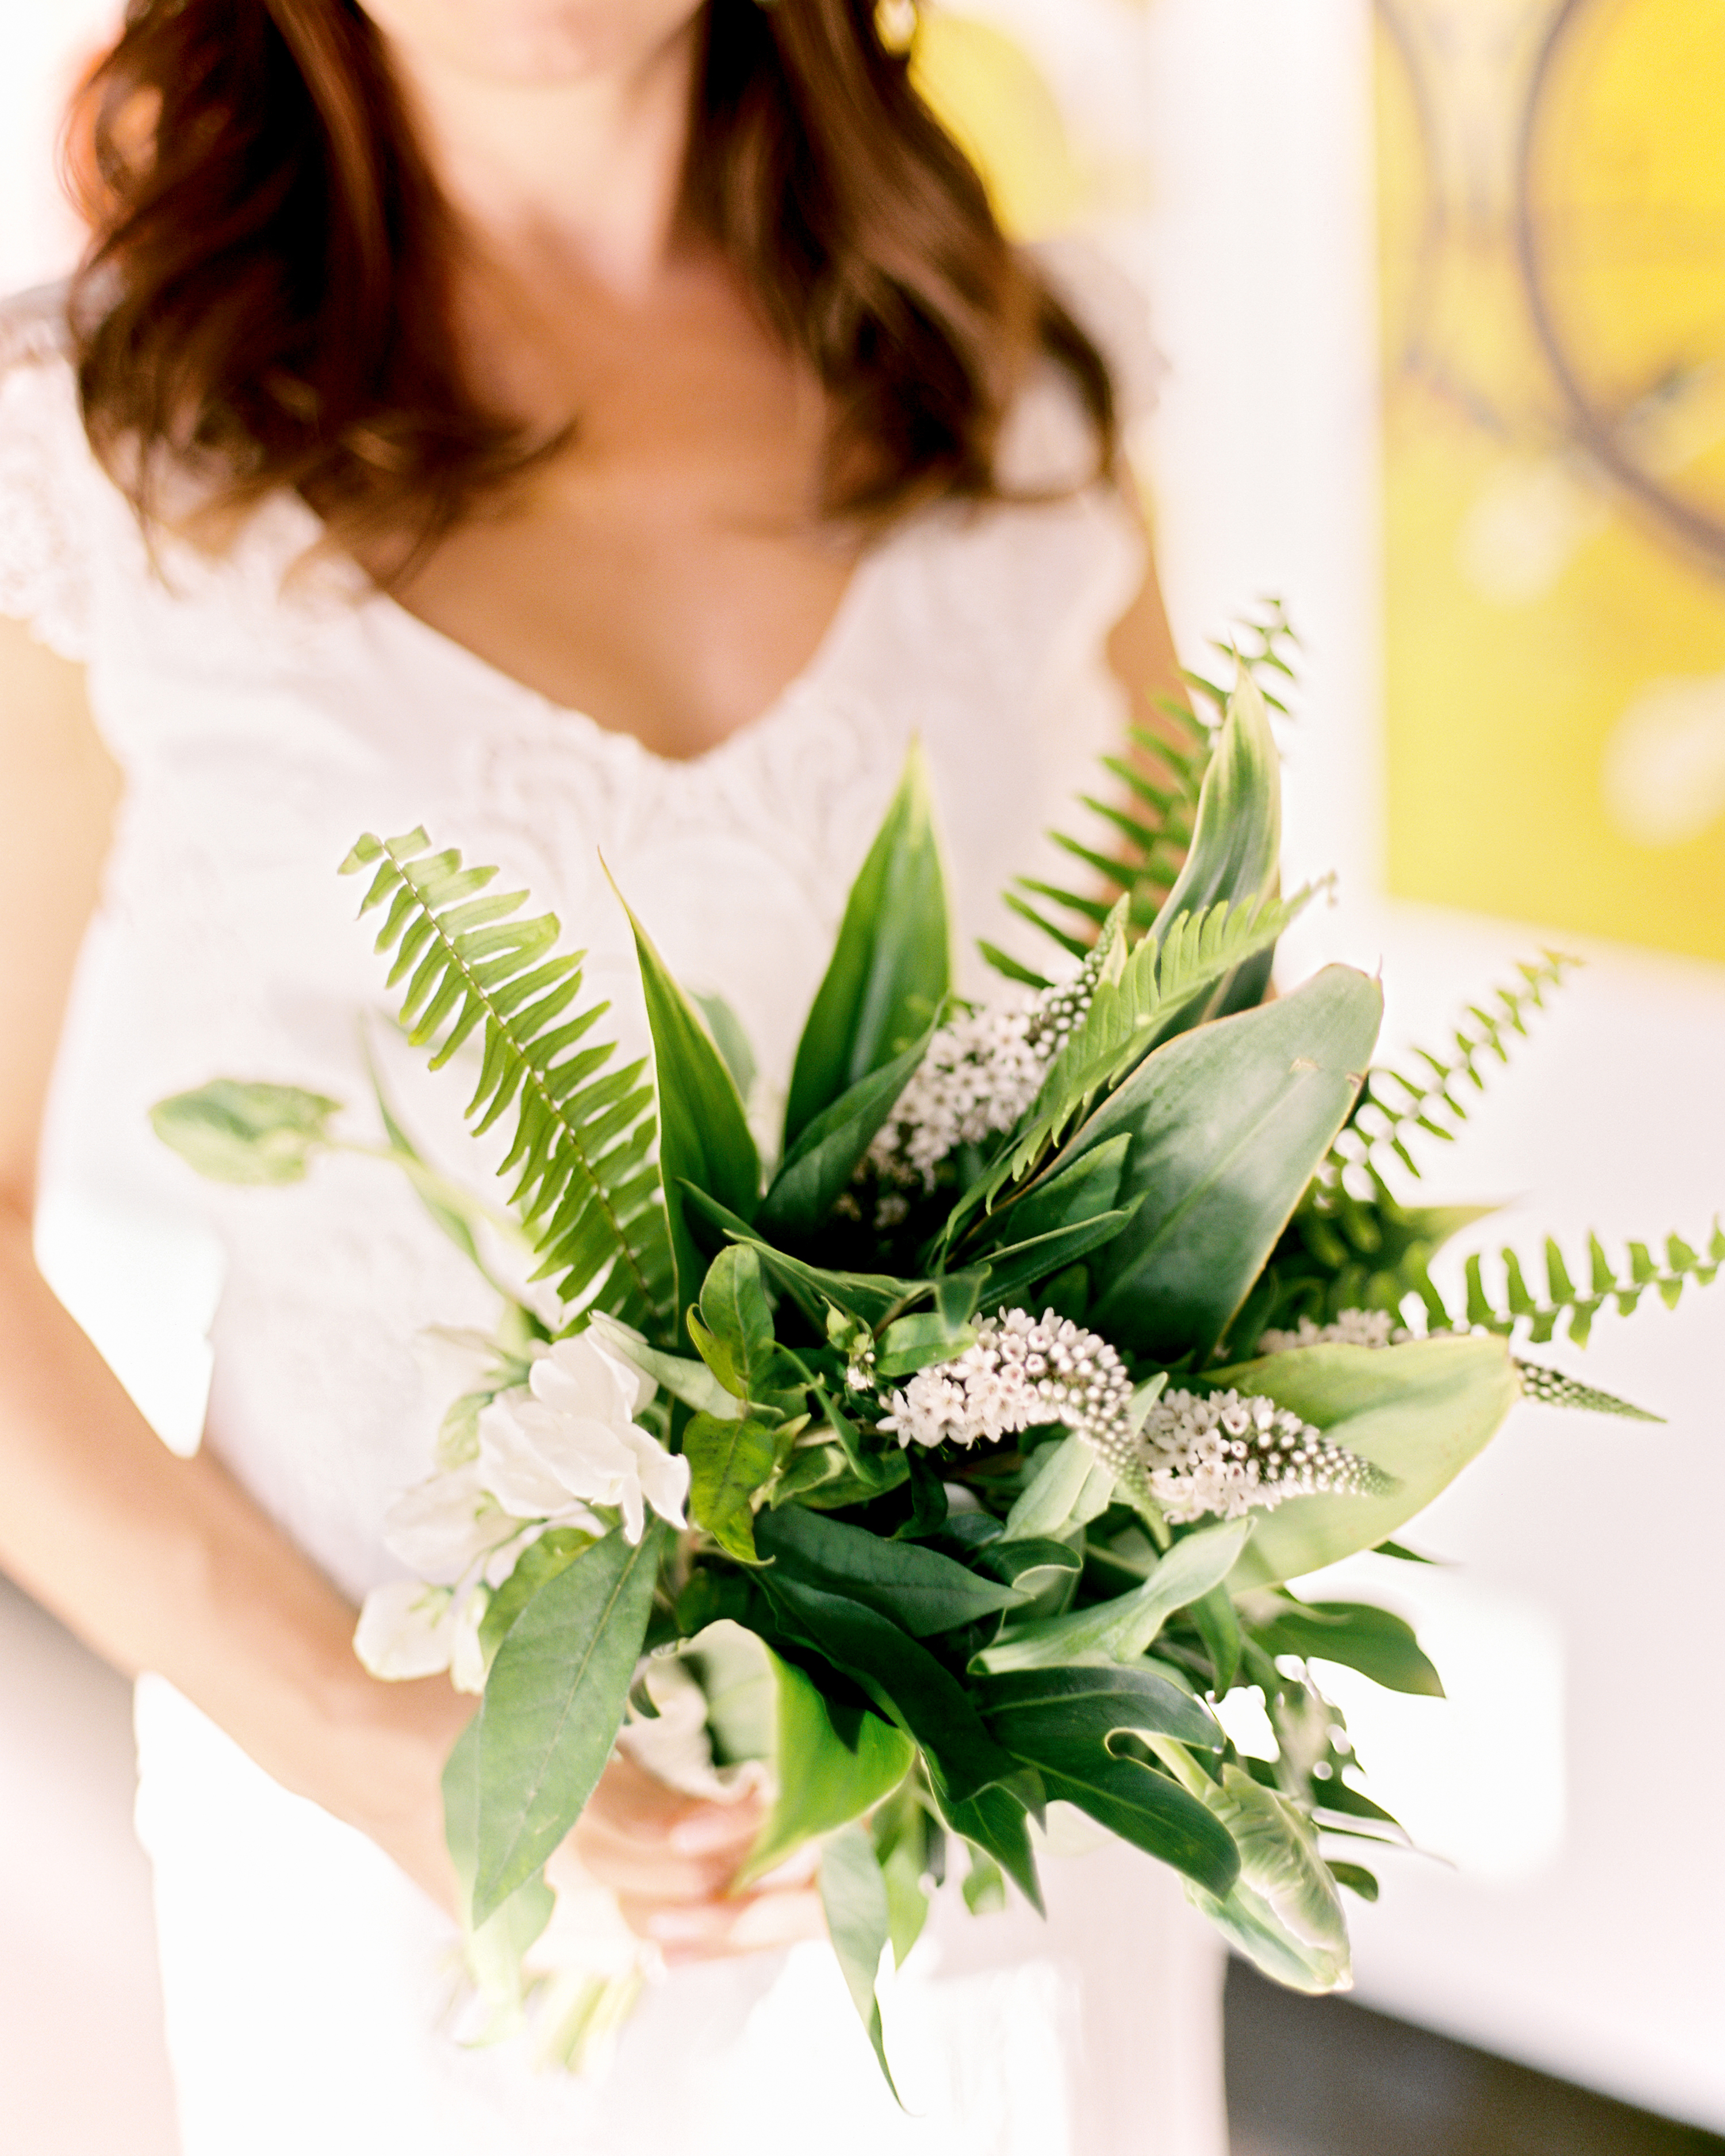 sydney-mike-wedding-bouquet-57-s111778-0215.jpg